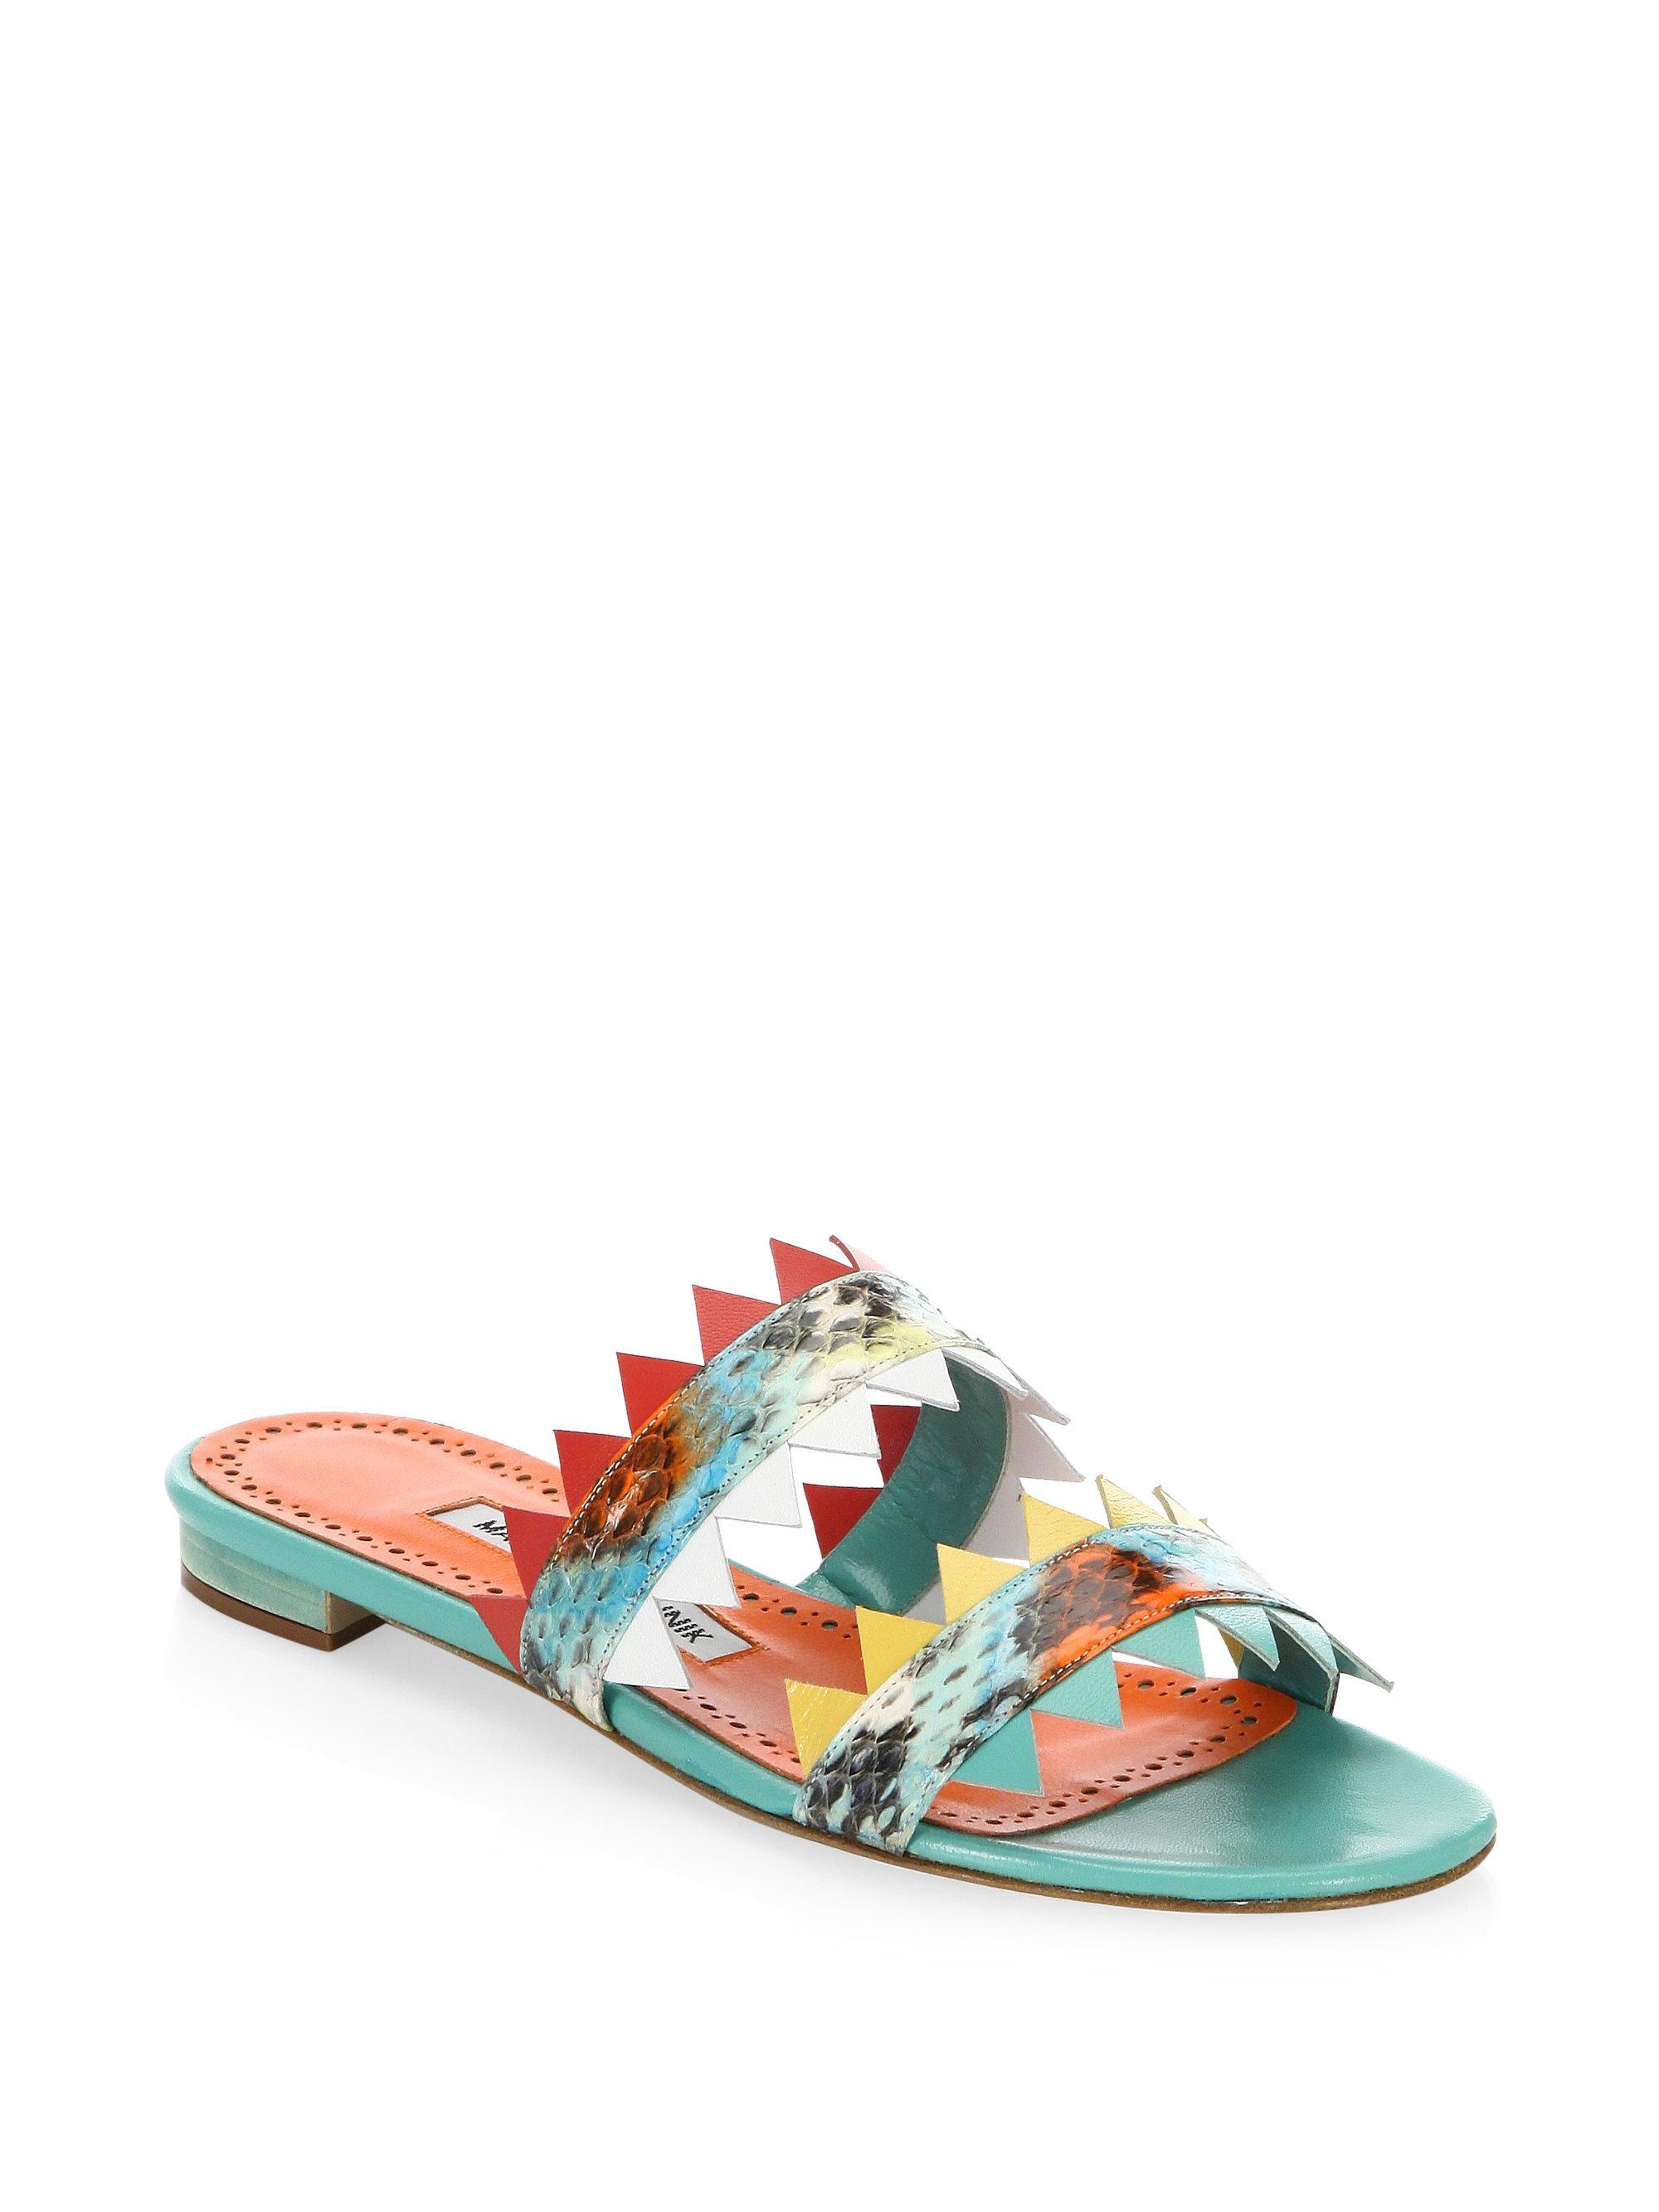 Manolo Blahnik Scalloped-Trim Leather Sandals QZaUAjCWV